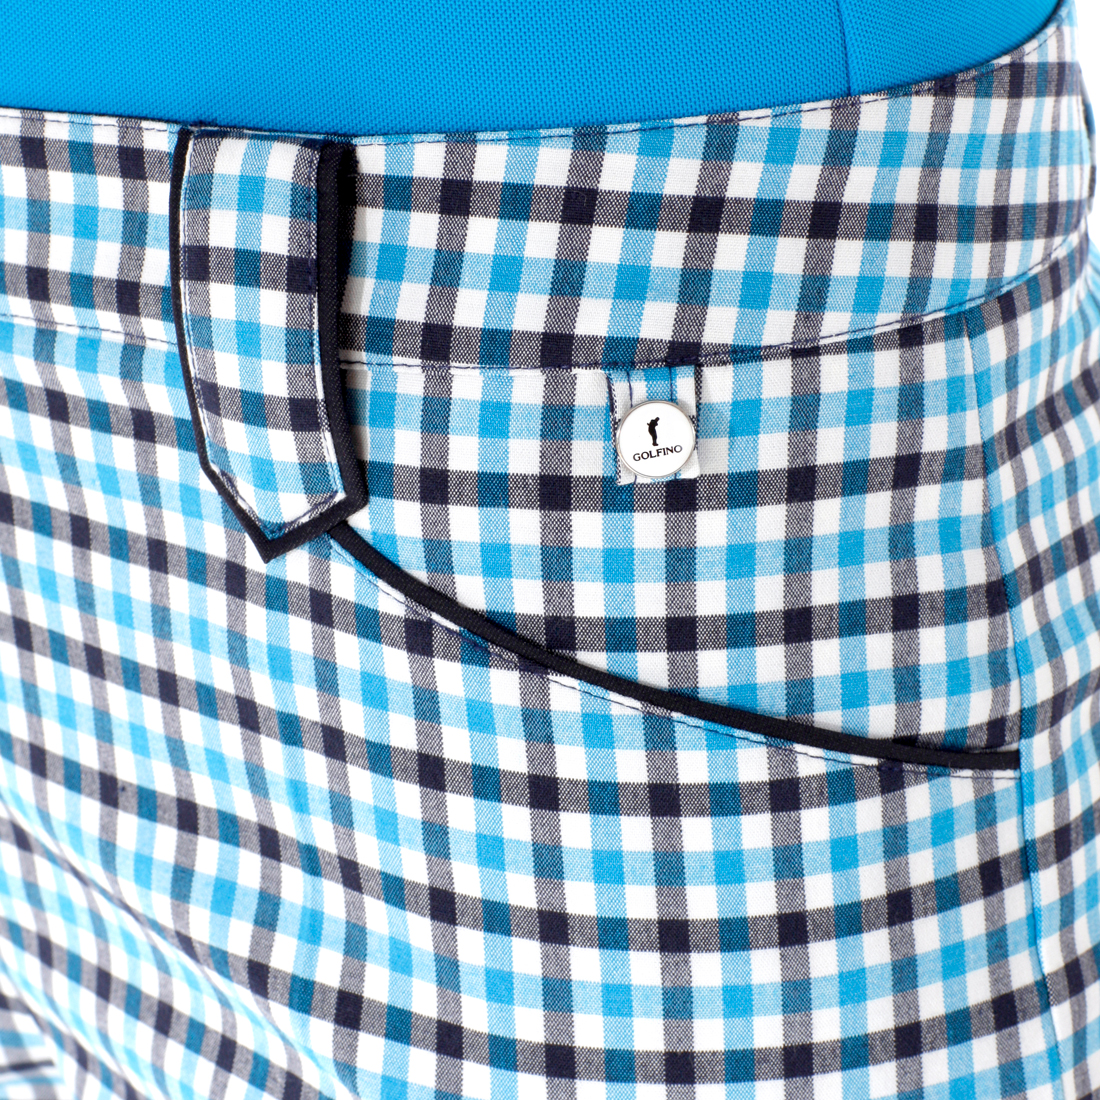 Damen Karo-Golfhose aus Stretchmaterial